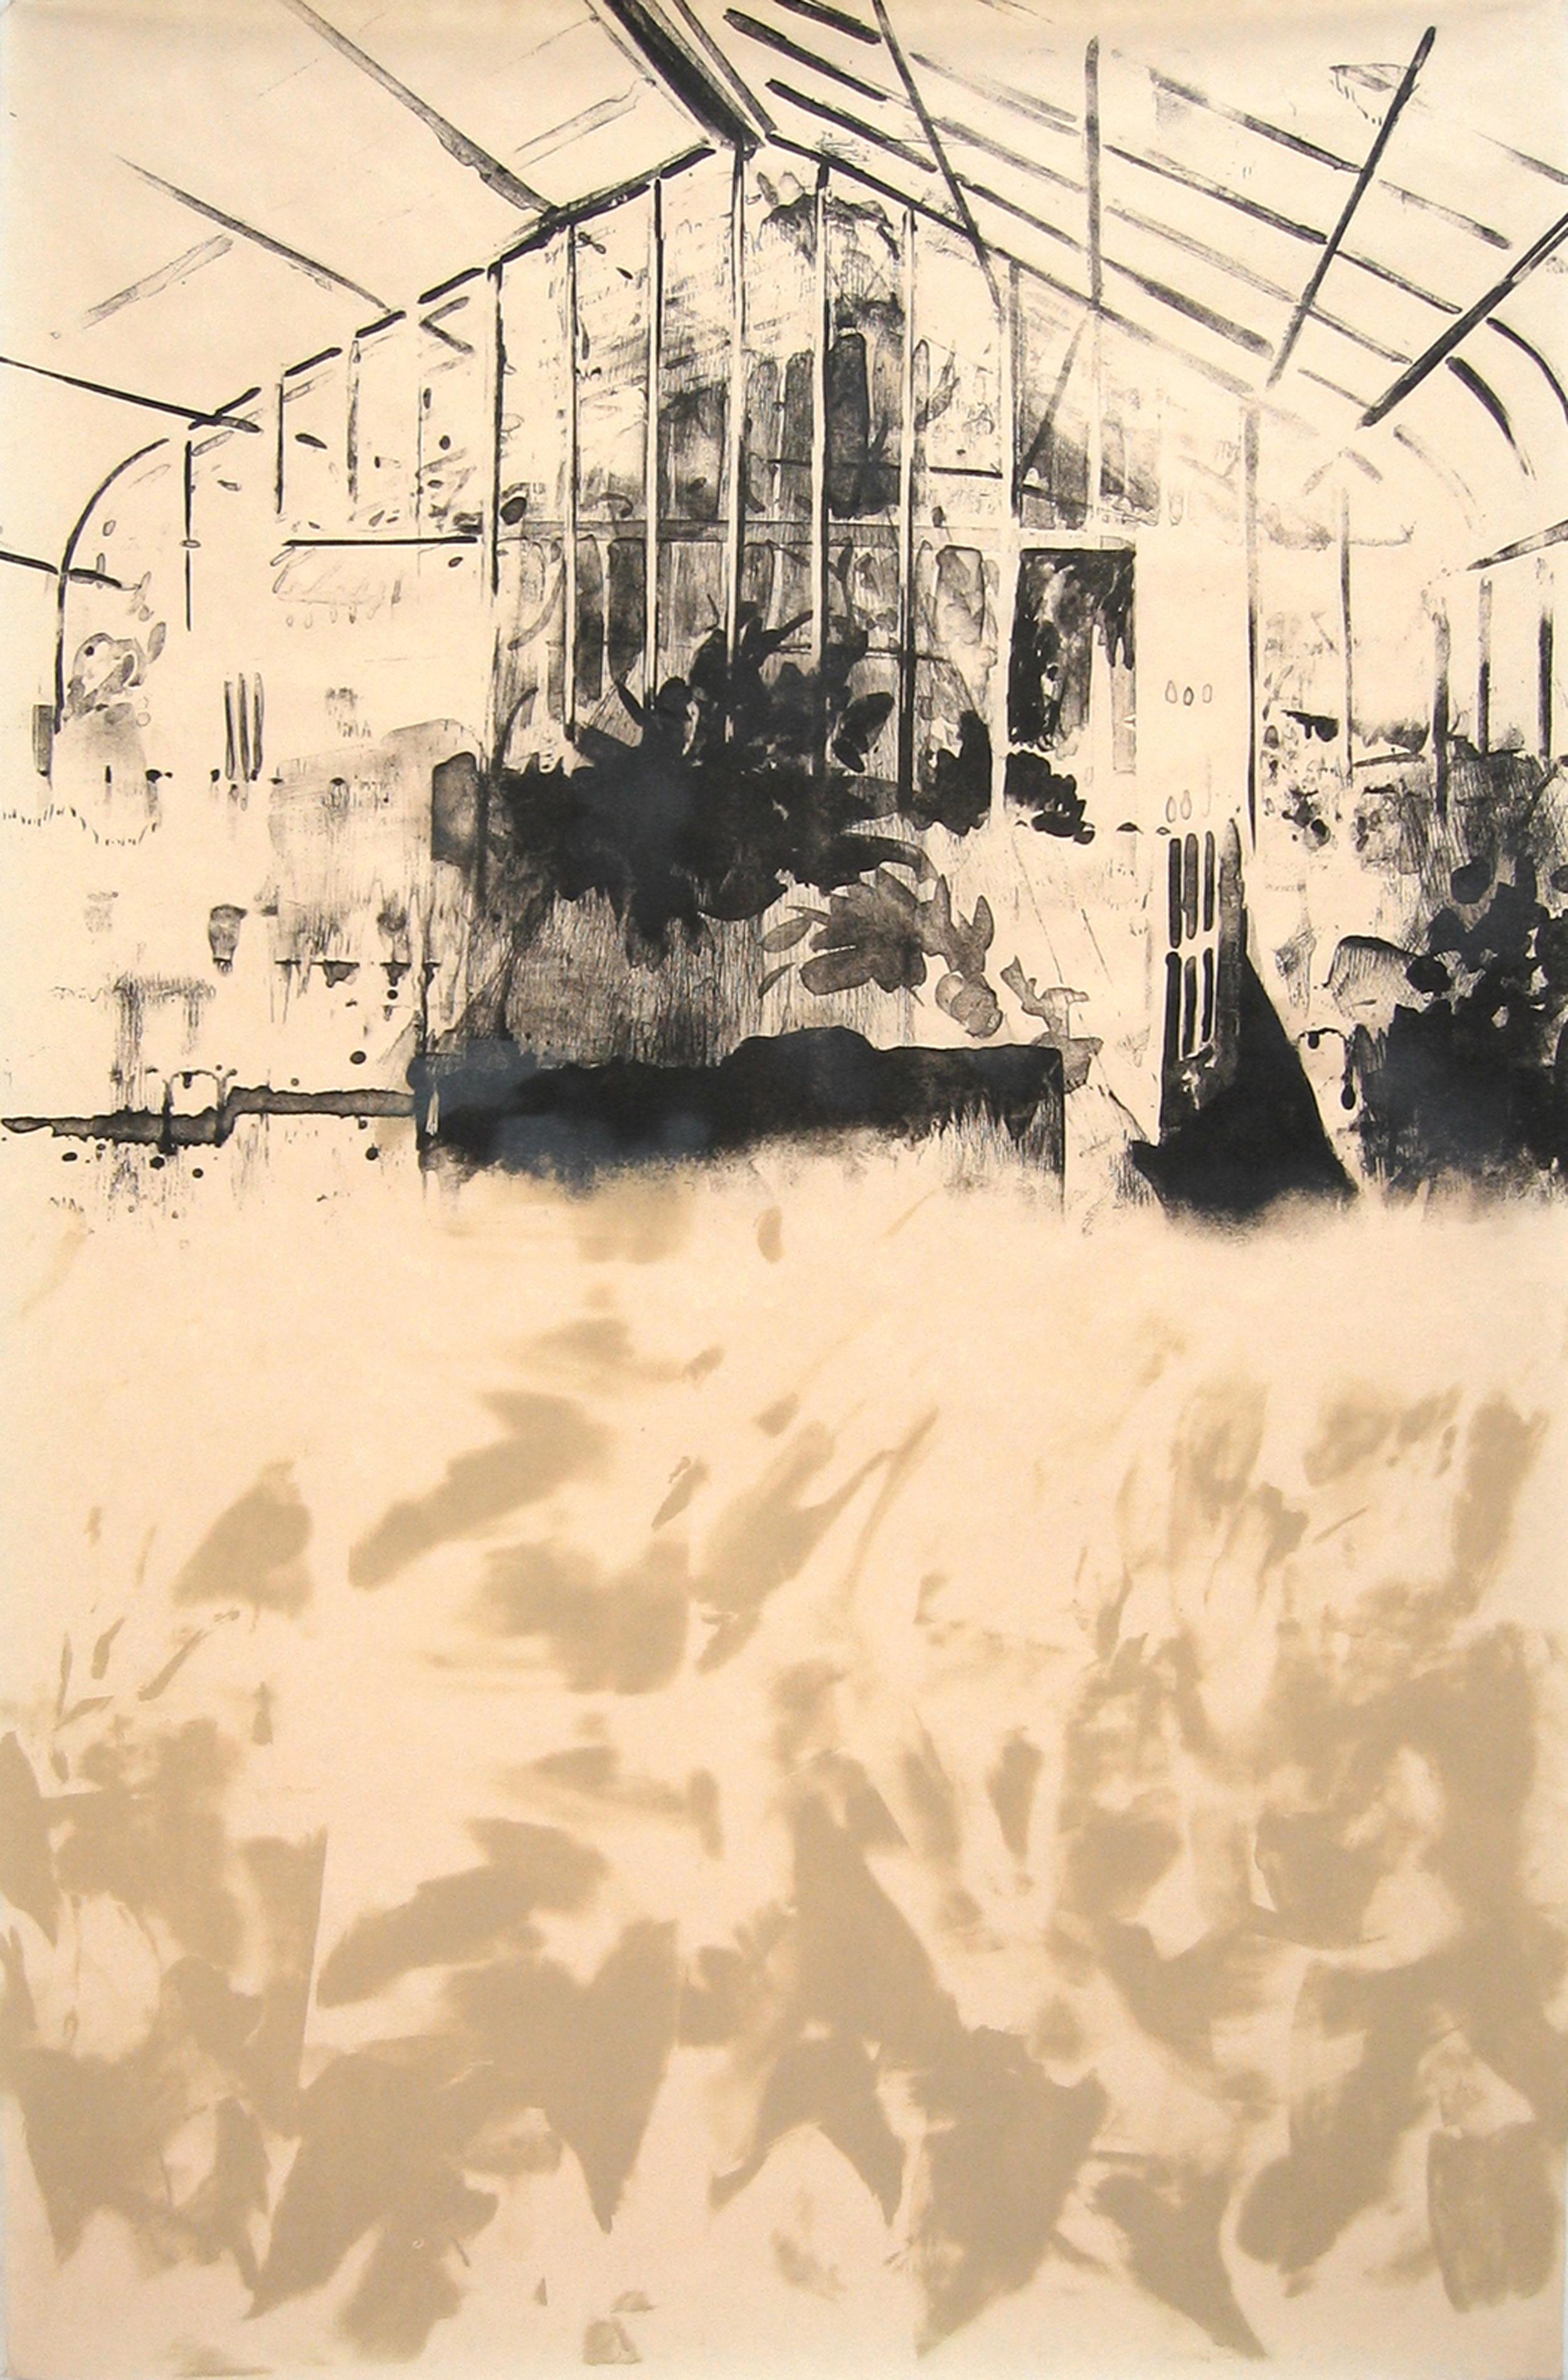 """Stone Greenhouse IV"" by Joel Janowitz 2005"